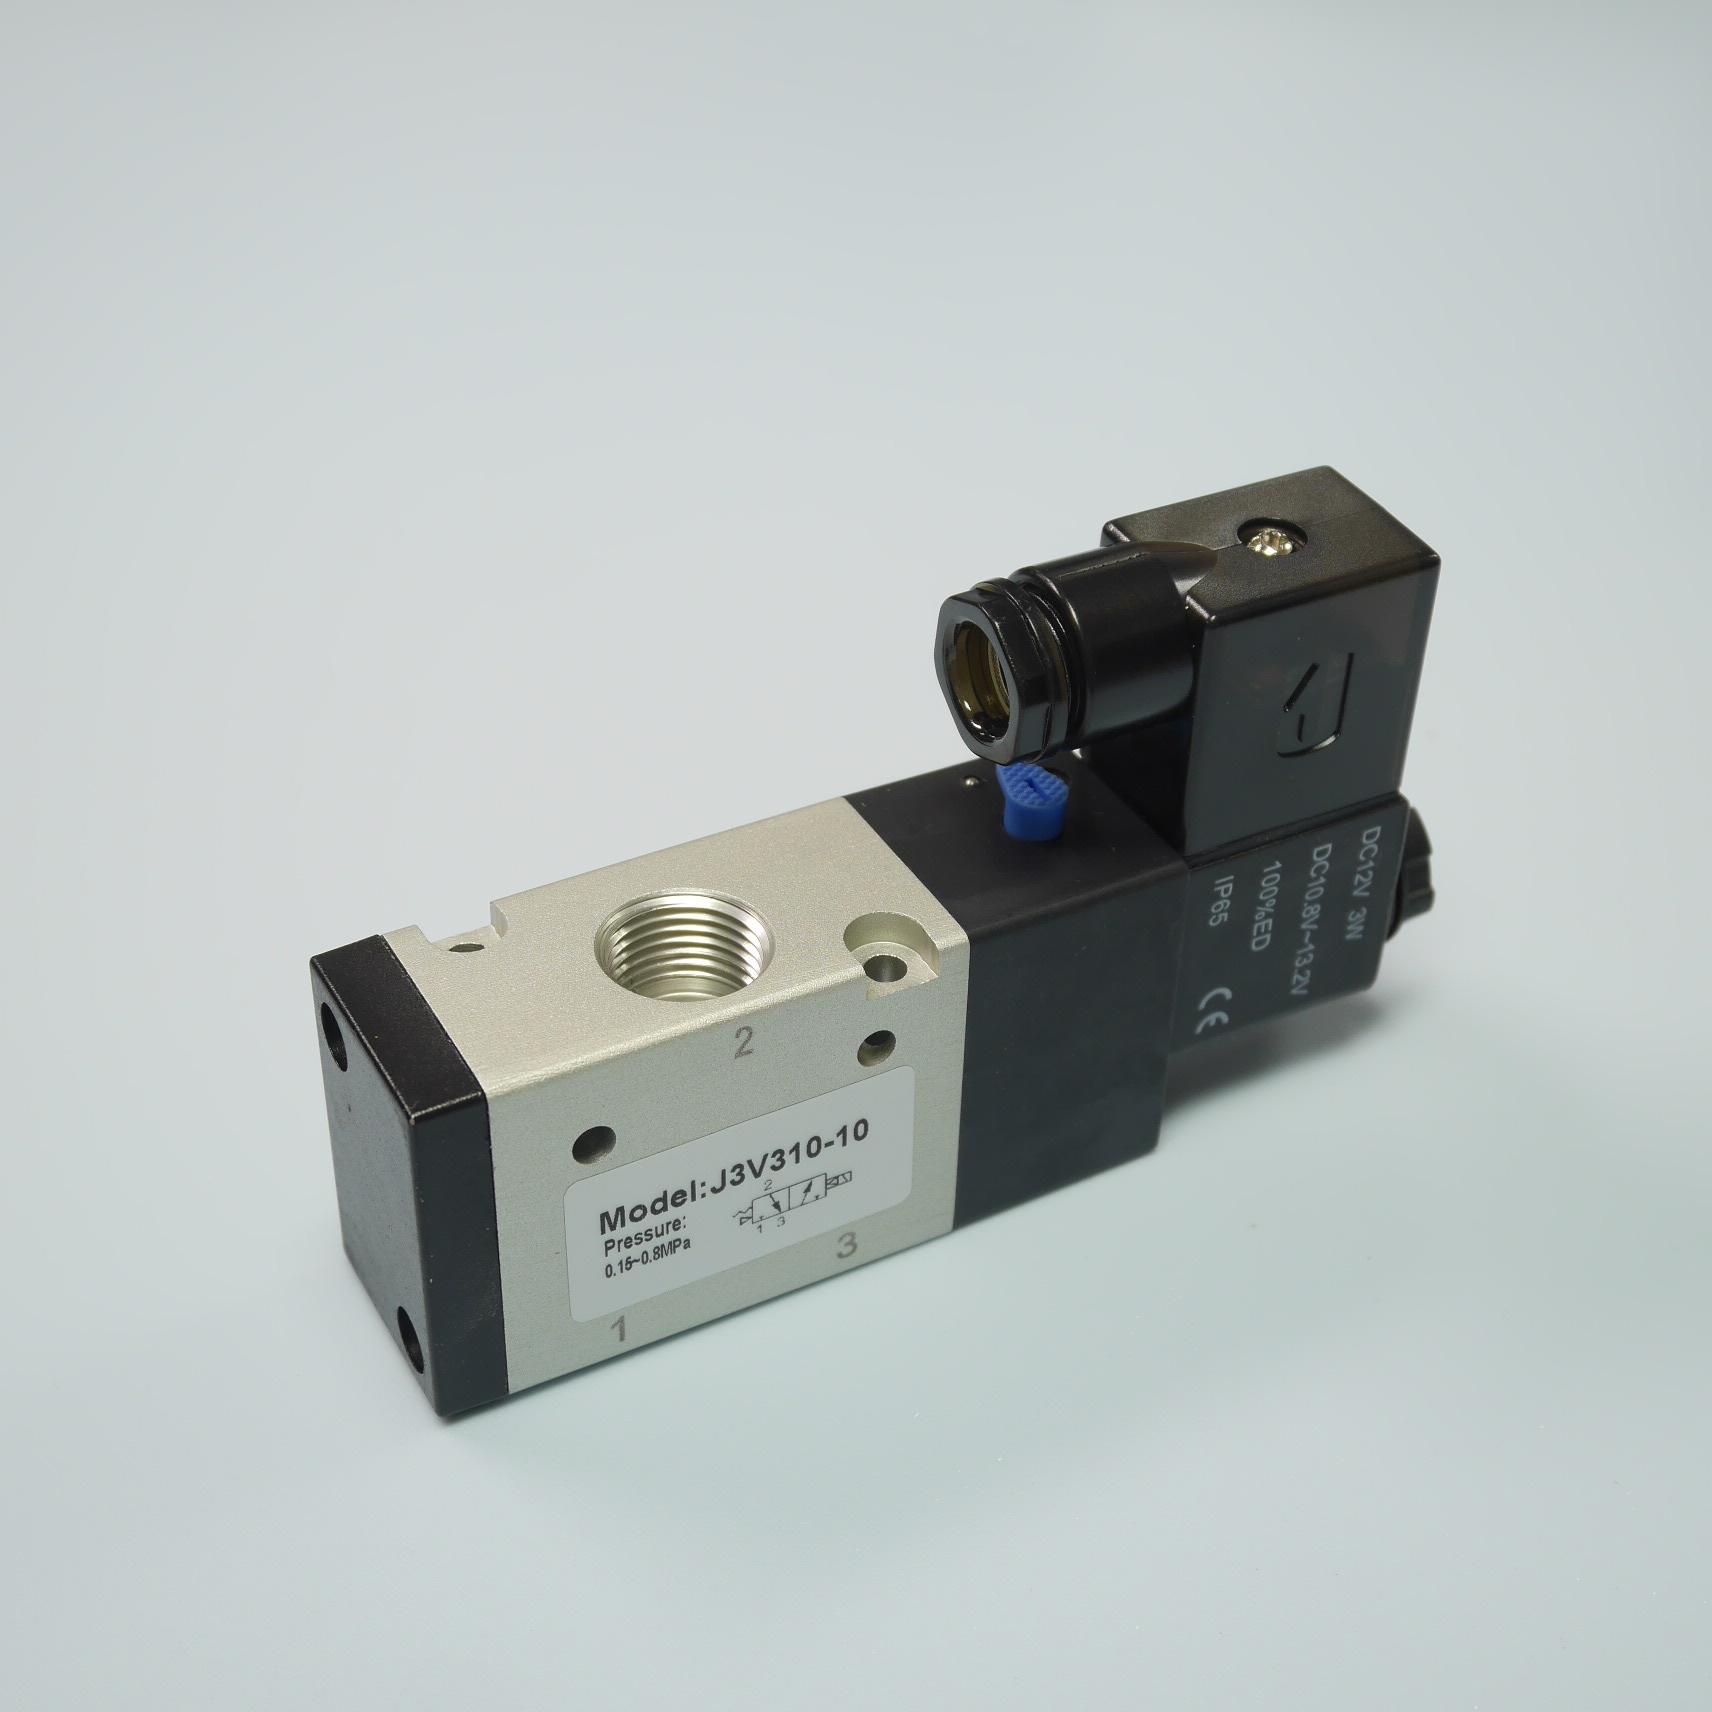 2 way vs 3 valve 1996 nissan sentra radio wiring diagram solenoid 8 npt ports 3v310 10 hqc tools